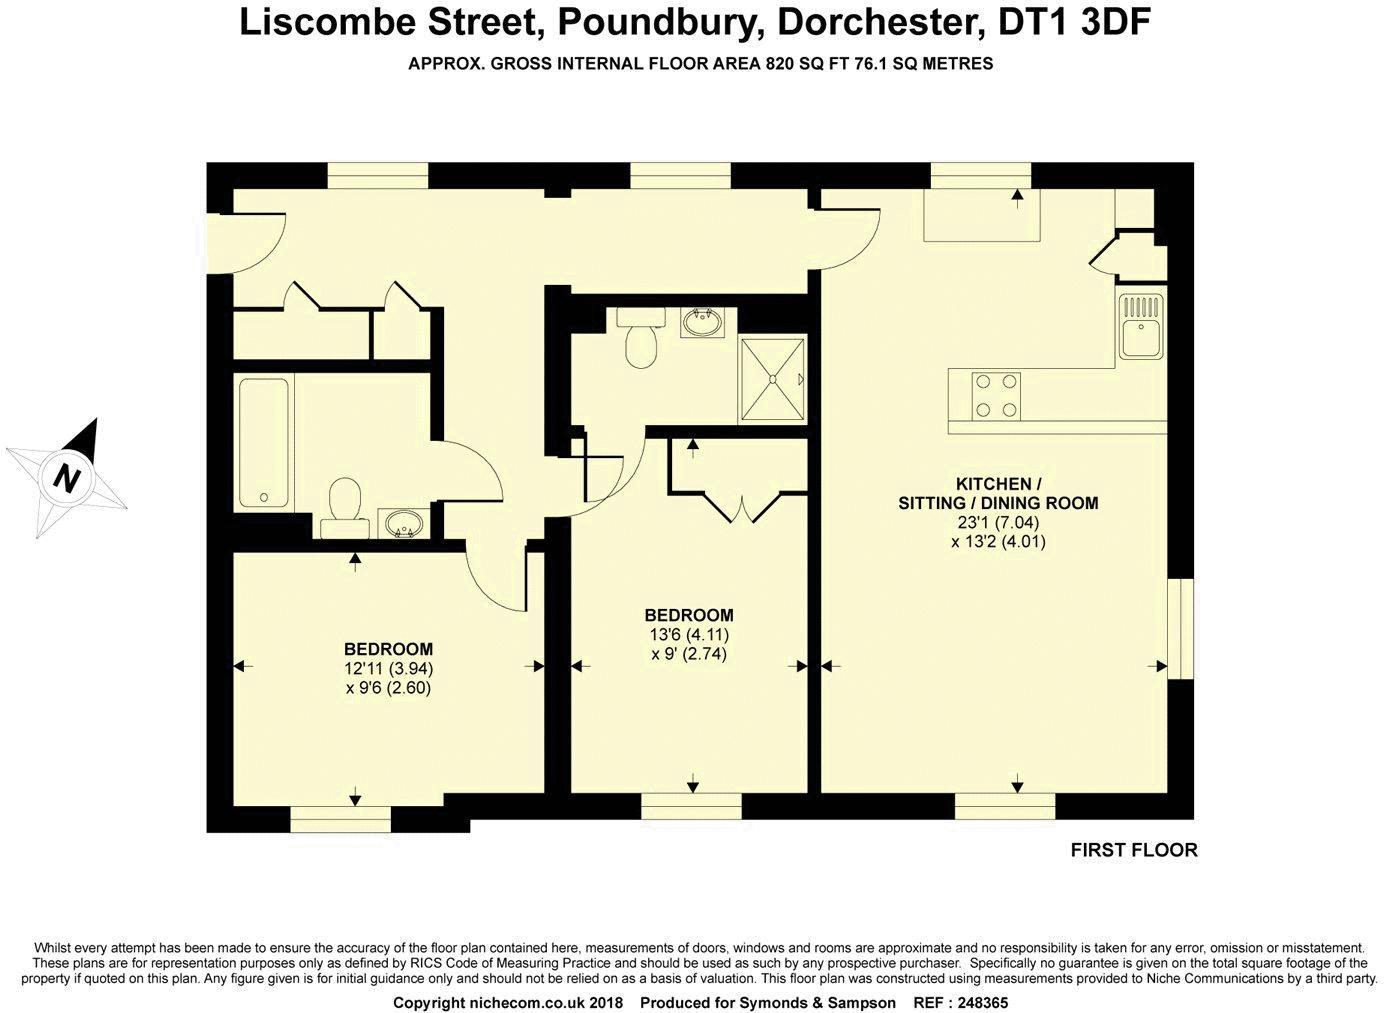 1 Liscombe Street Poundbury